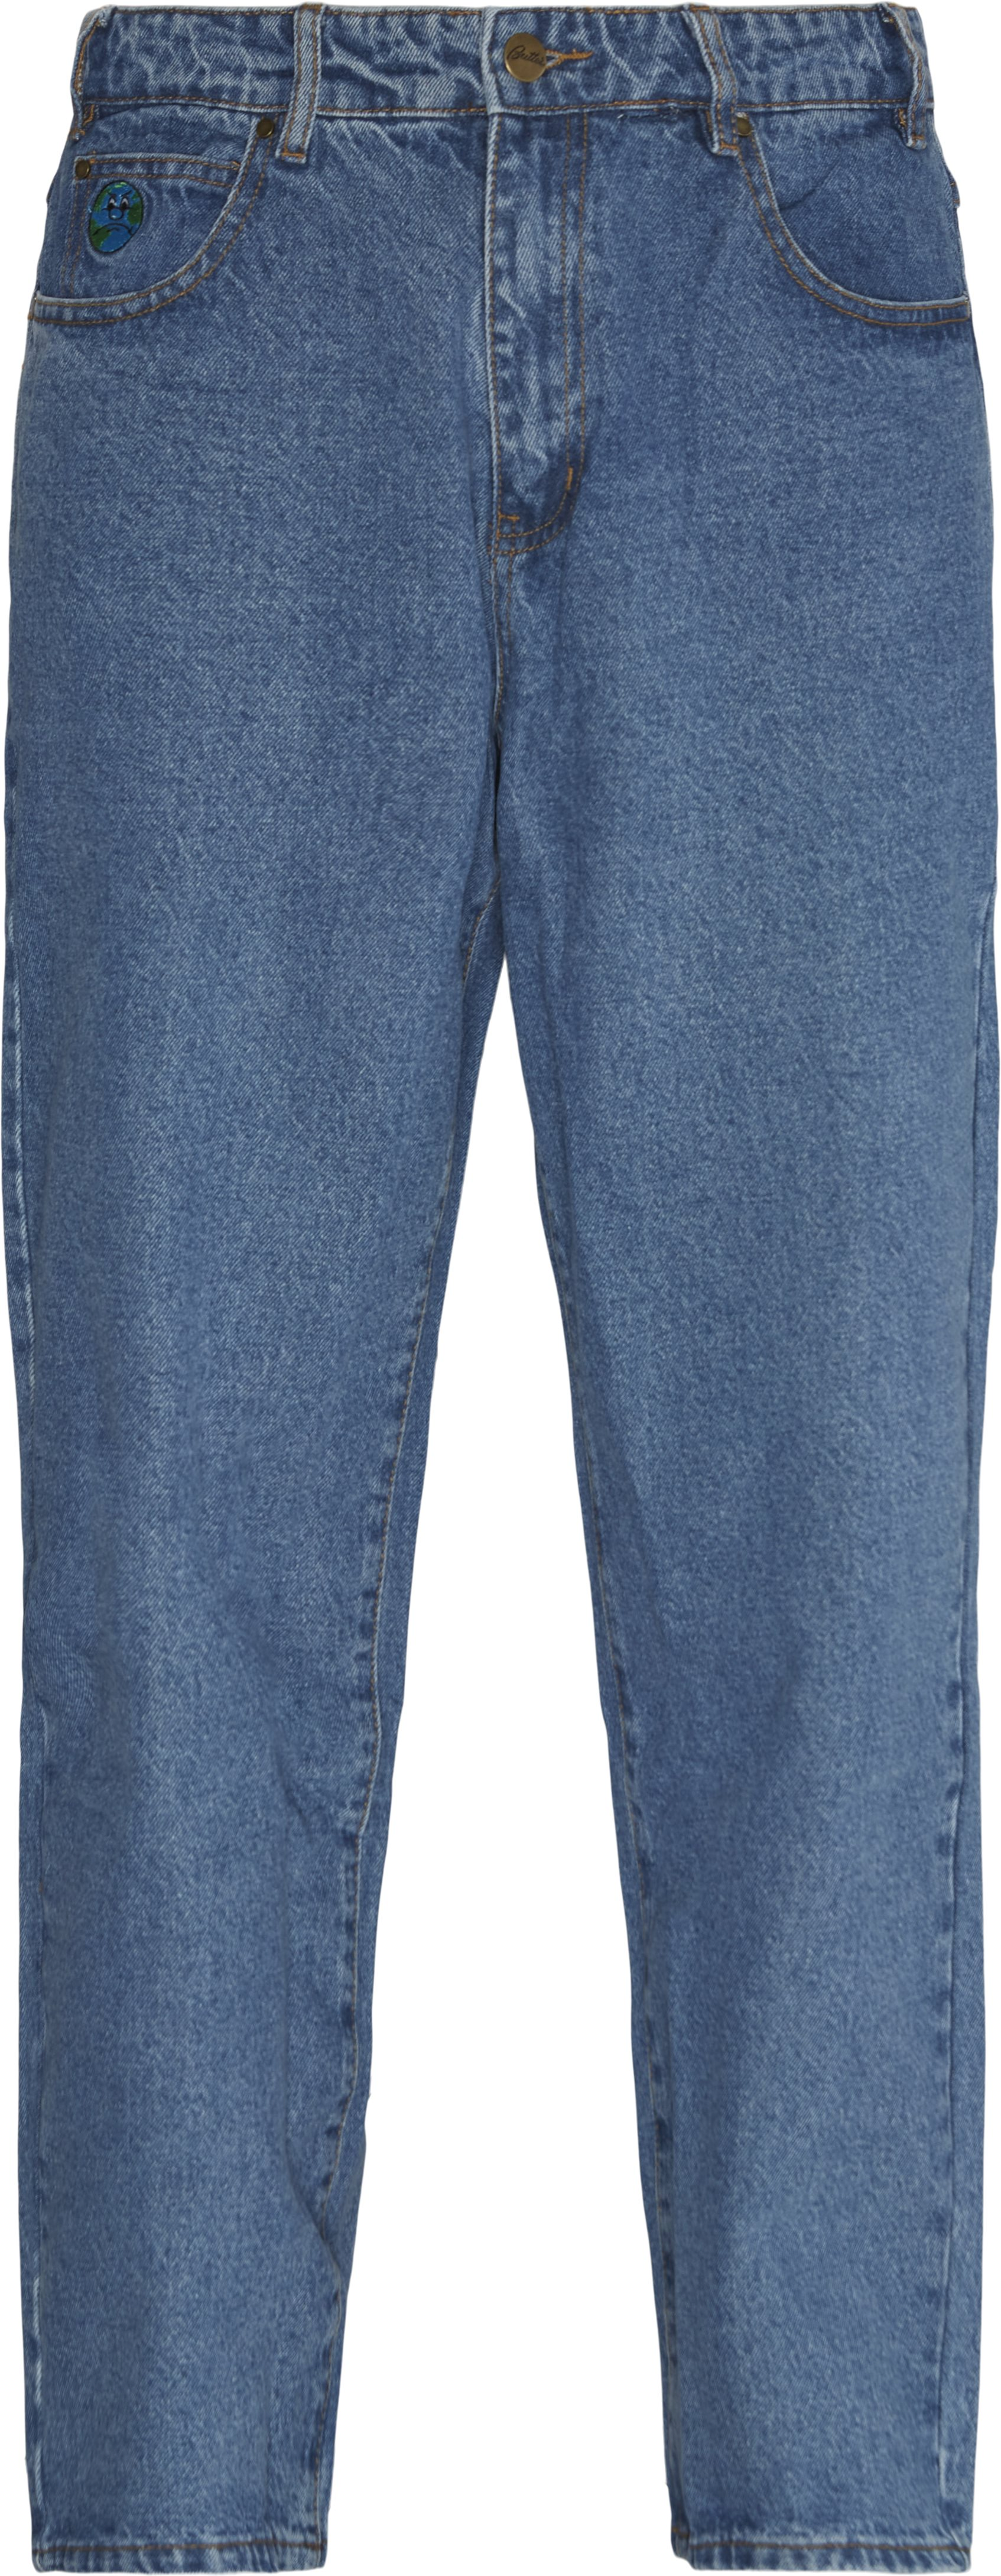 Jeans - Loose fit - Denim